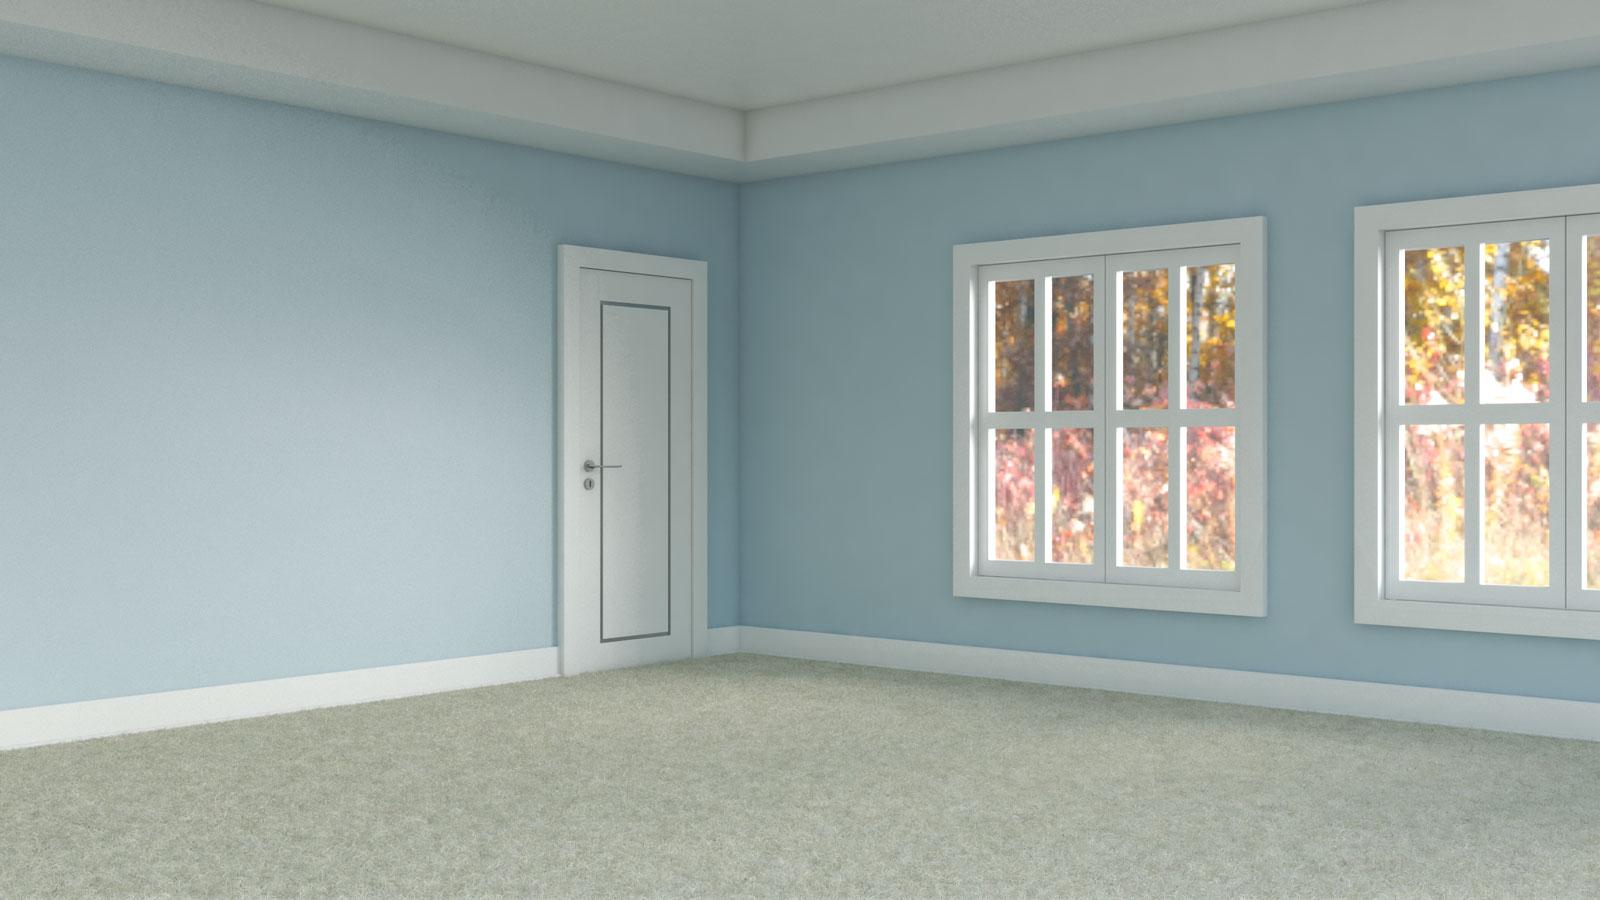 Cream flooring with sky blue walls